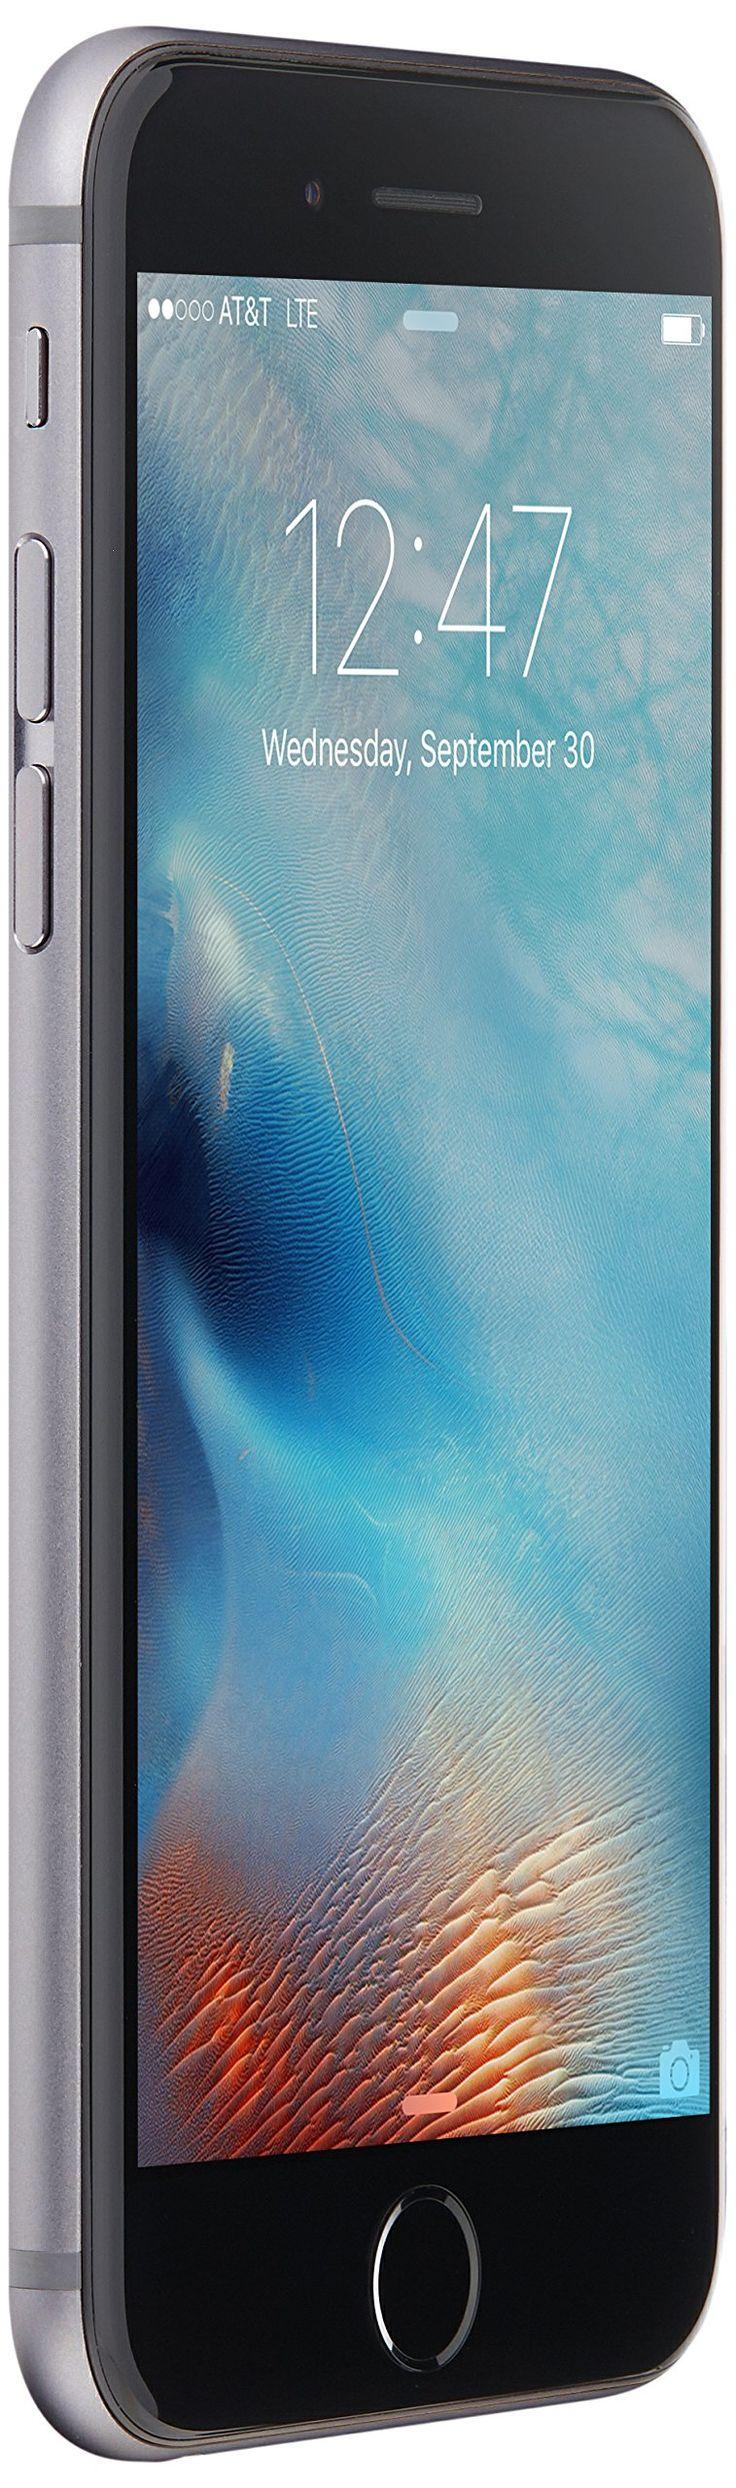 Apple iPhone 6S 64 GB Unlocked, Space Grey International Version